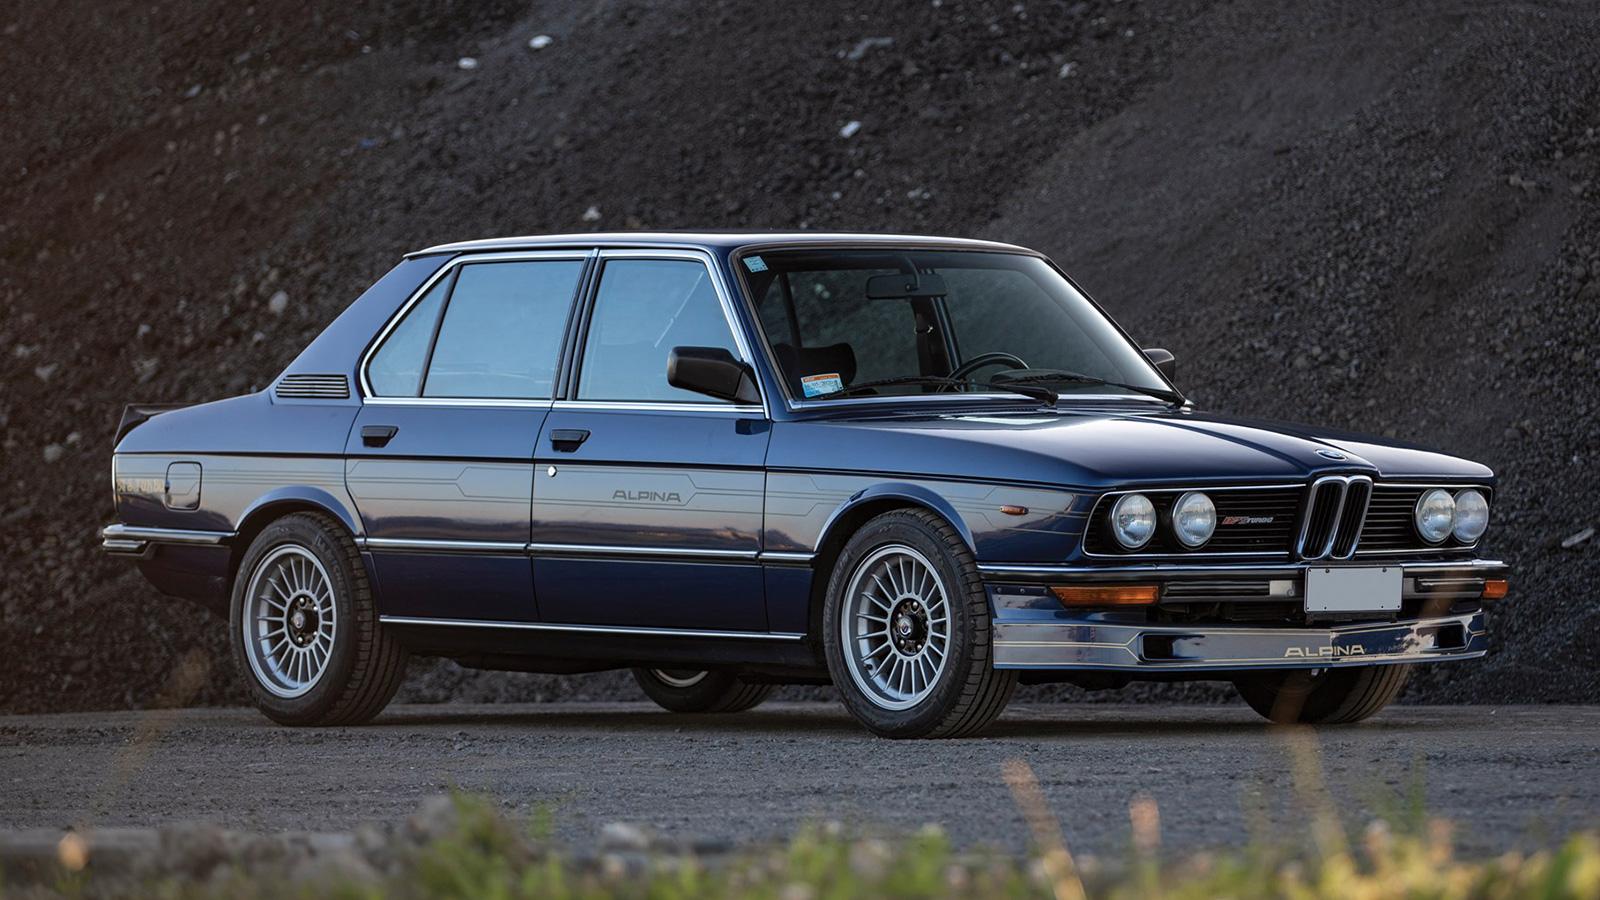 1982 BMW Alpina B7 S Turbo